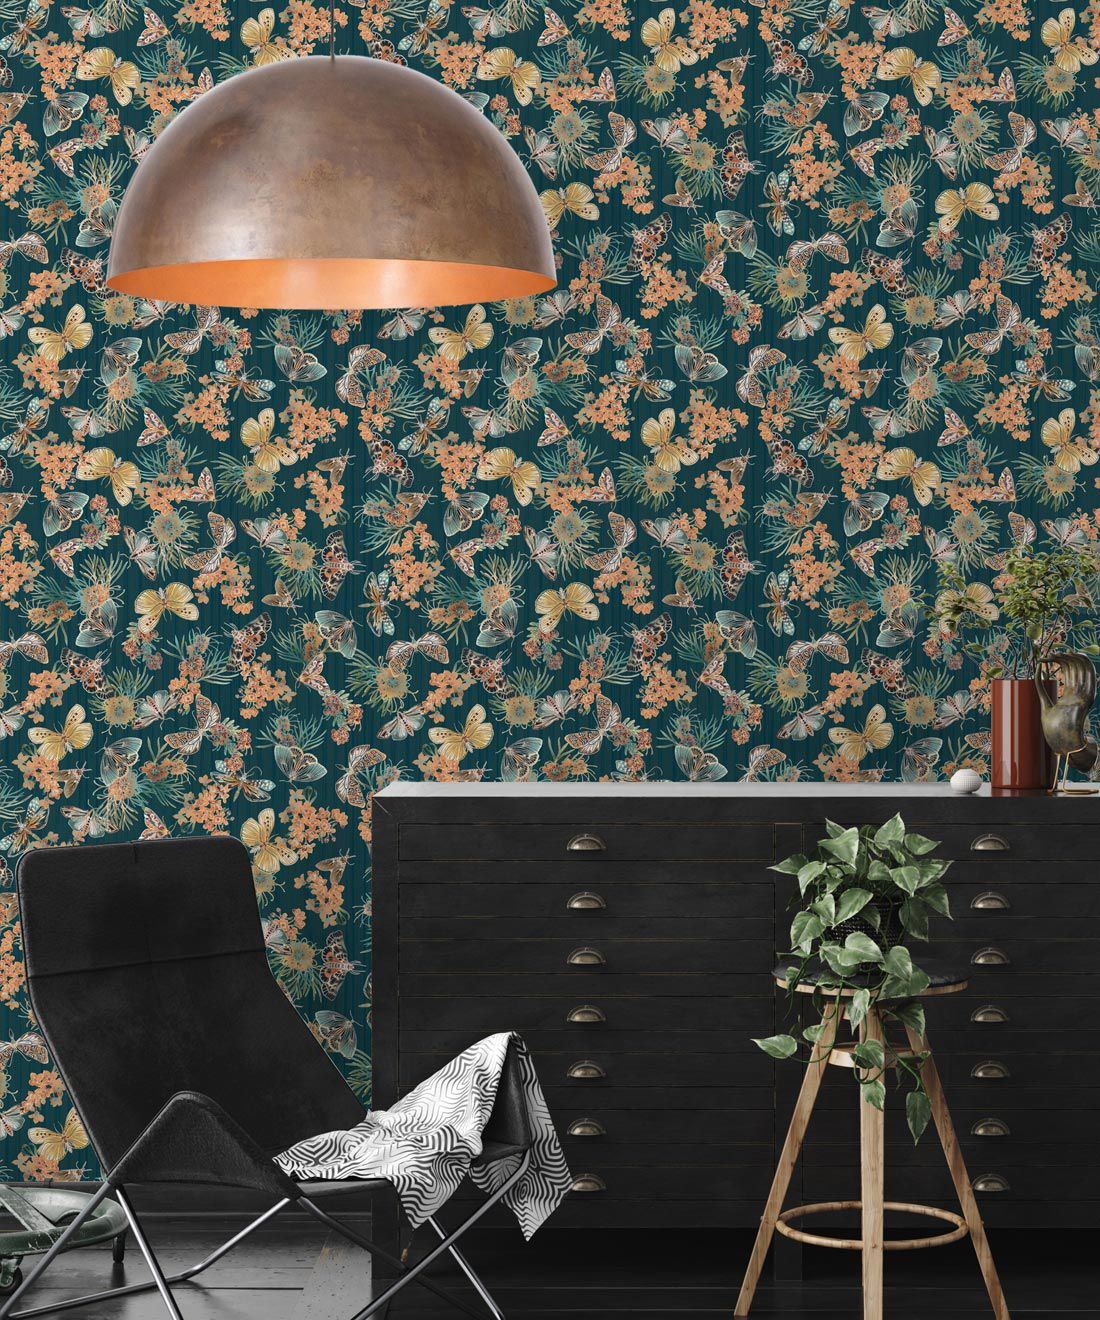 Moth Wallpaper • Eloise Short • Vintage Floral Wallpaper •Granny Chic Wallpaper • Grandmillennial Style Wallpaper •Deep Ocean •Insitu